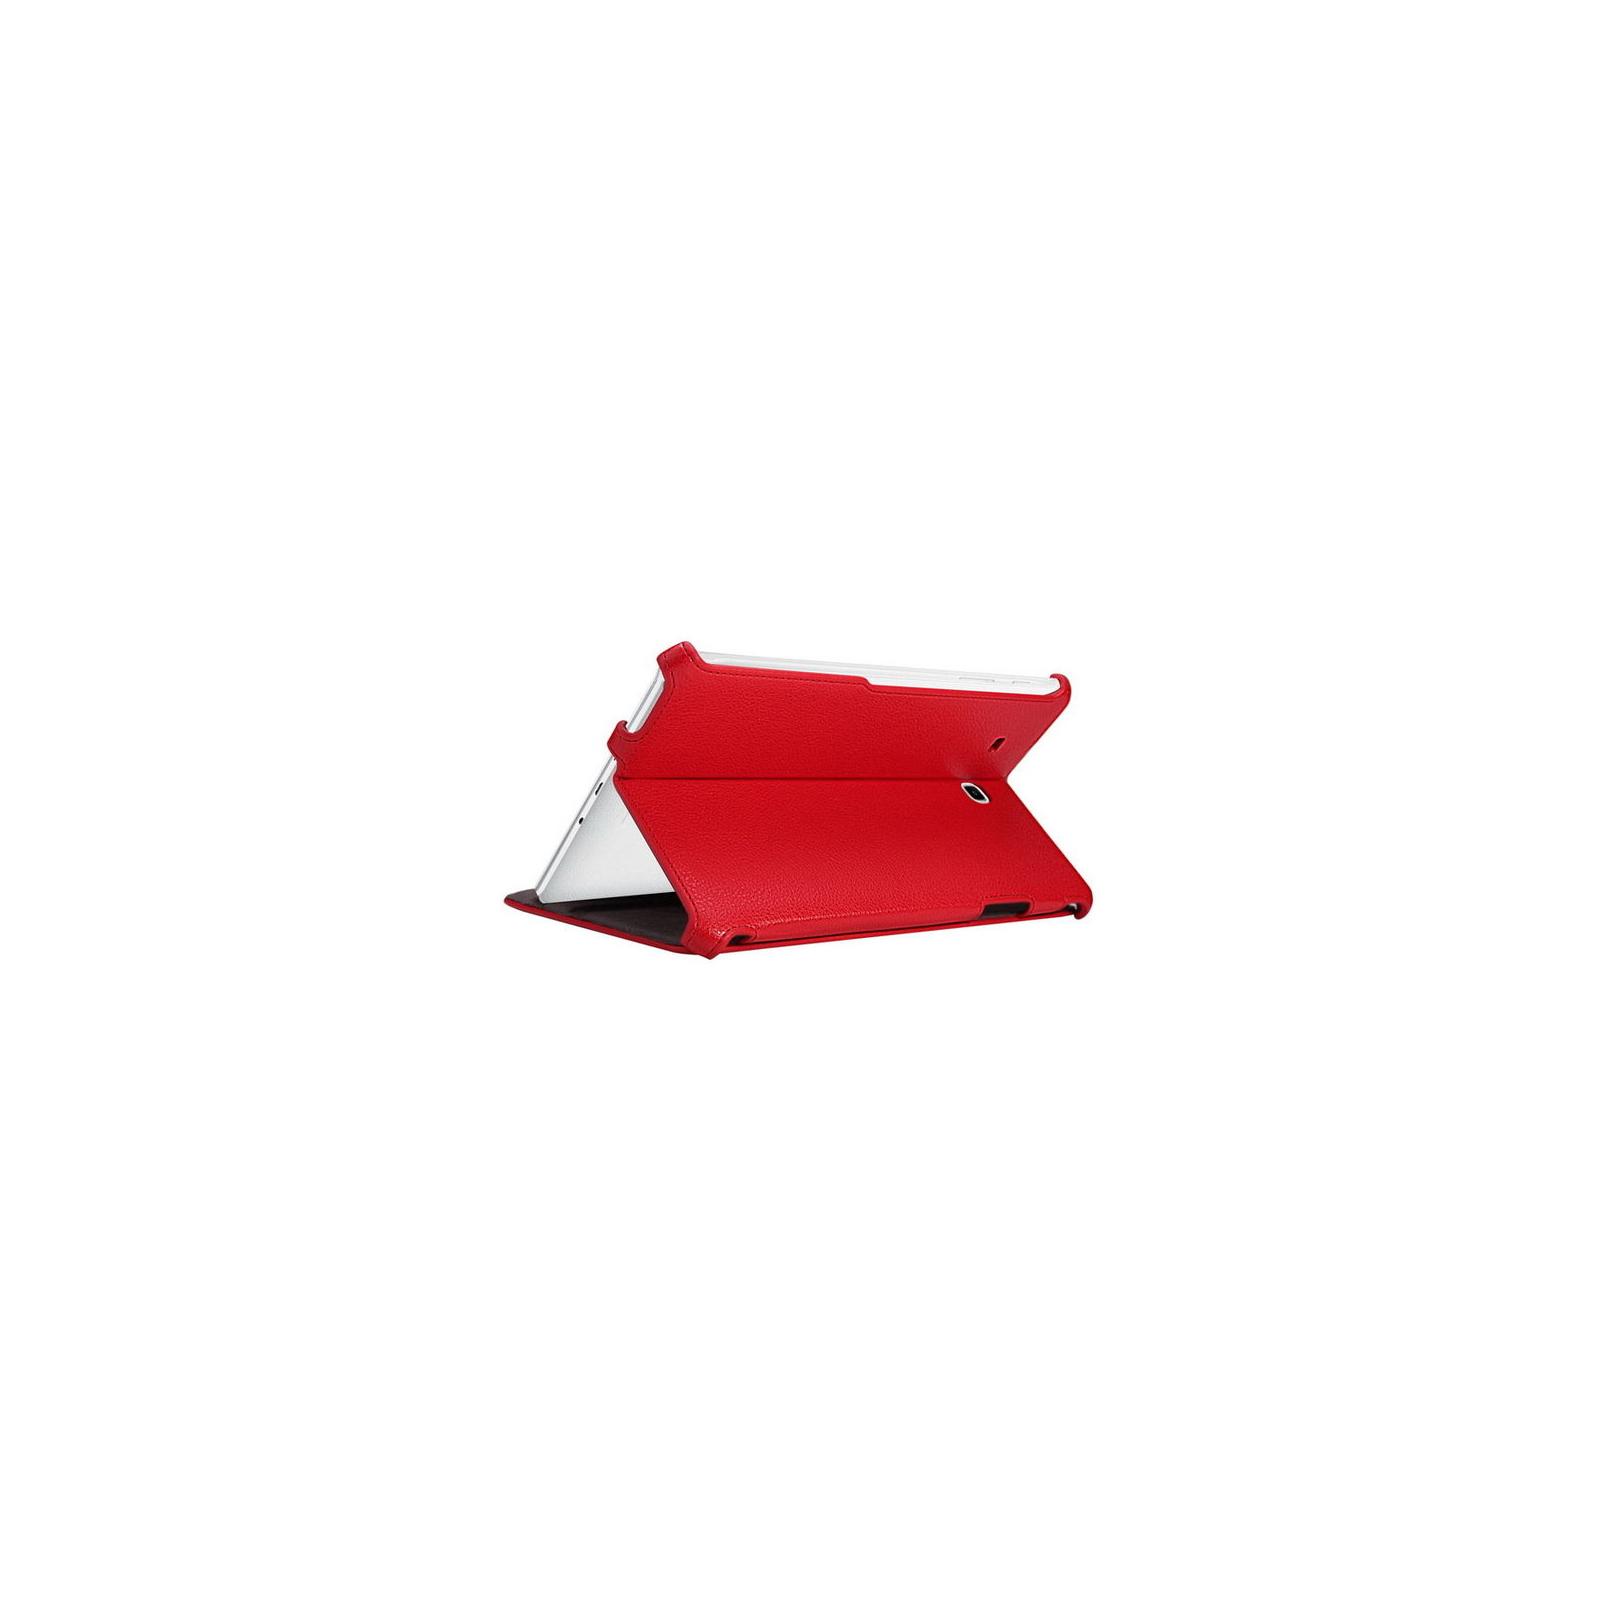 Чехол для планшета AirOn для Samsung Galaxy Tab E 9.6 red (4822352777258) изображение 7